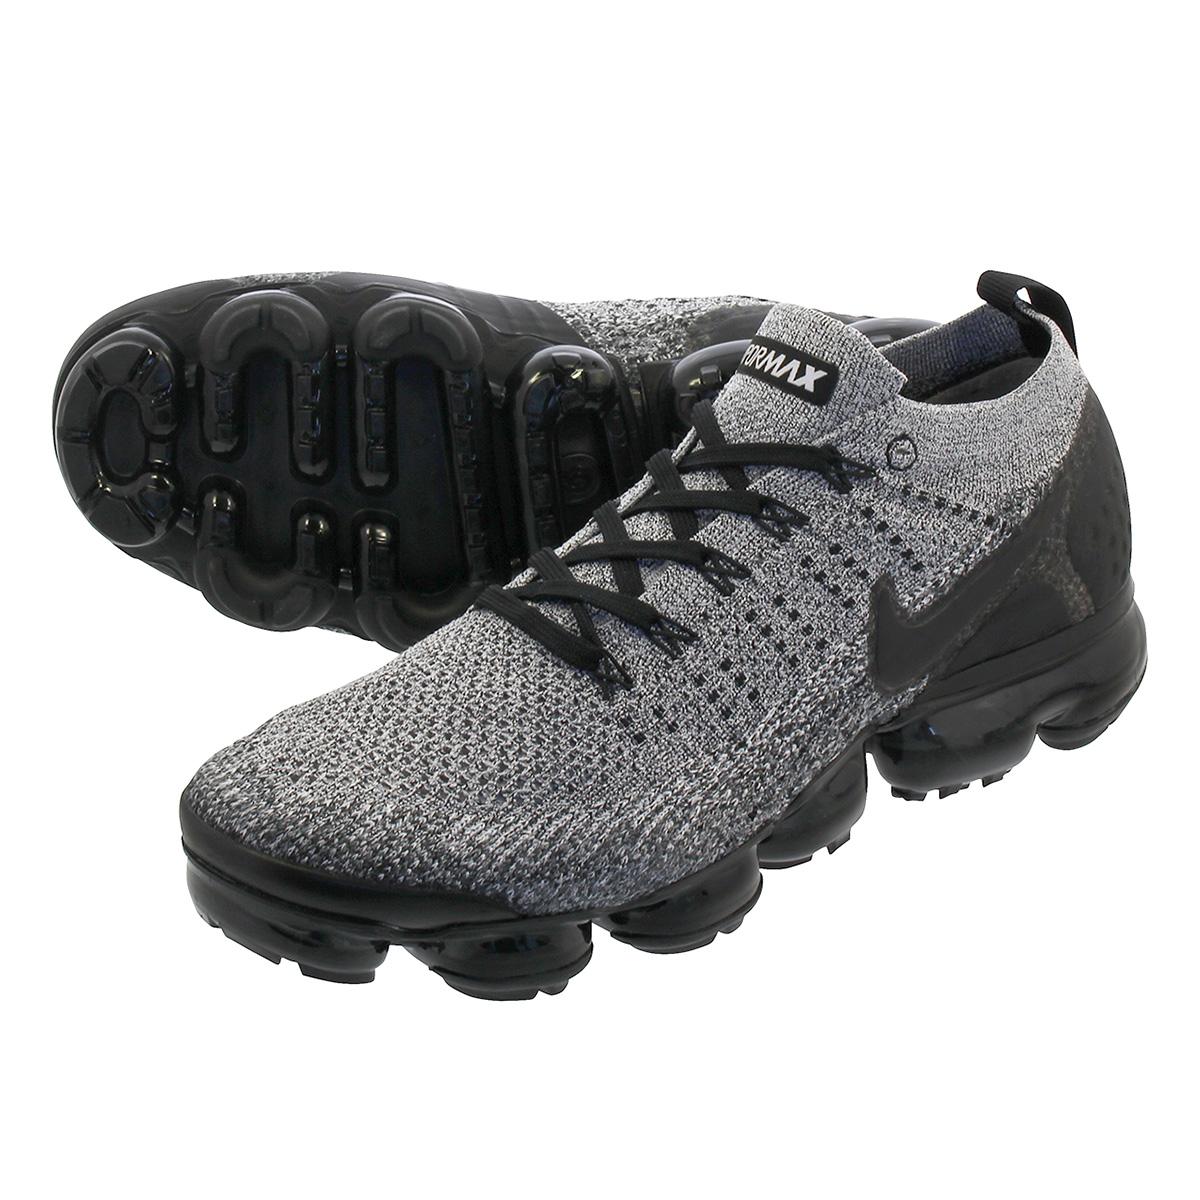 best website dcc87 f26f6 NIKE AIR VAPORMAX FLYKNIT 2 Nike vapor max fried food knit 2  WHITE/BLACK/BLACK 942,842-107